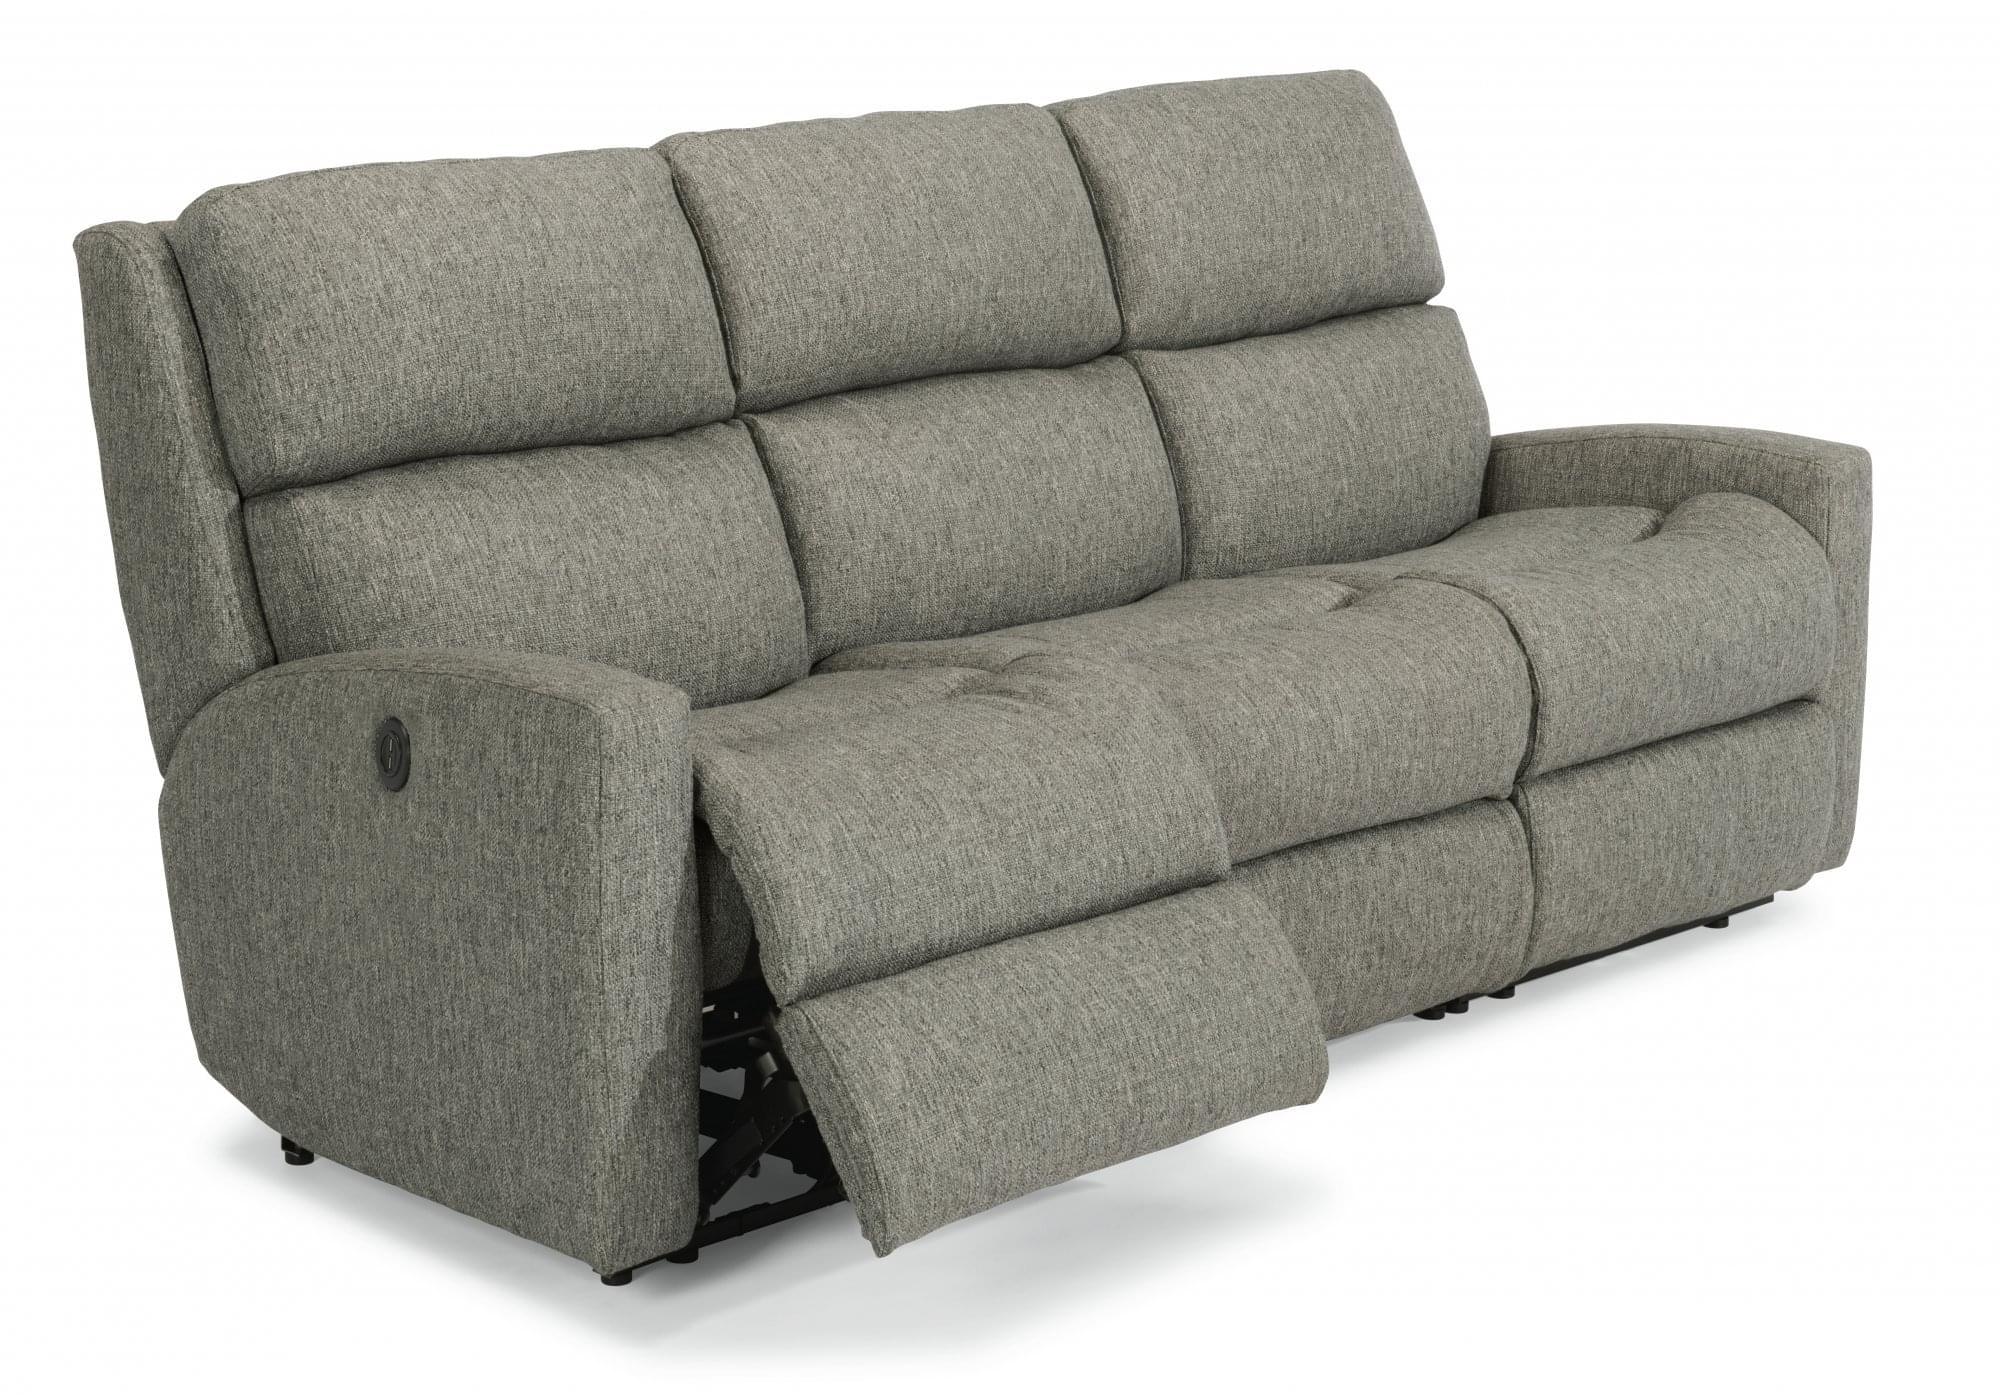 Flexsteel Catalina sofa at Mums Place Furniture Monterey CA